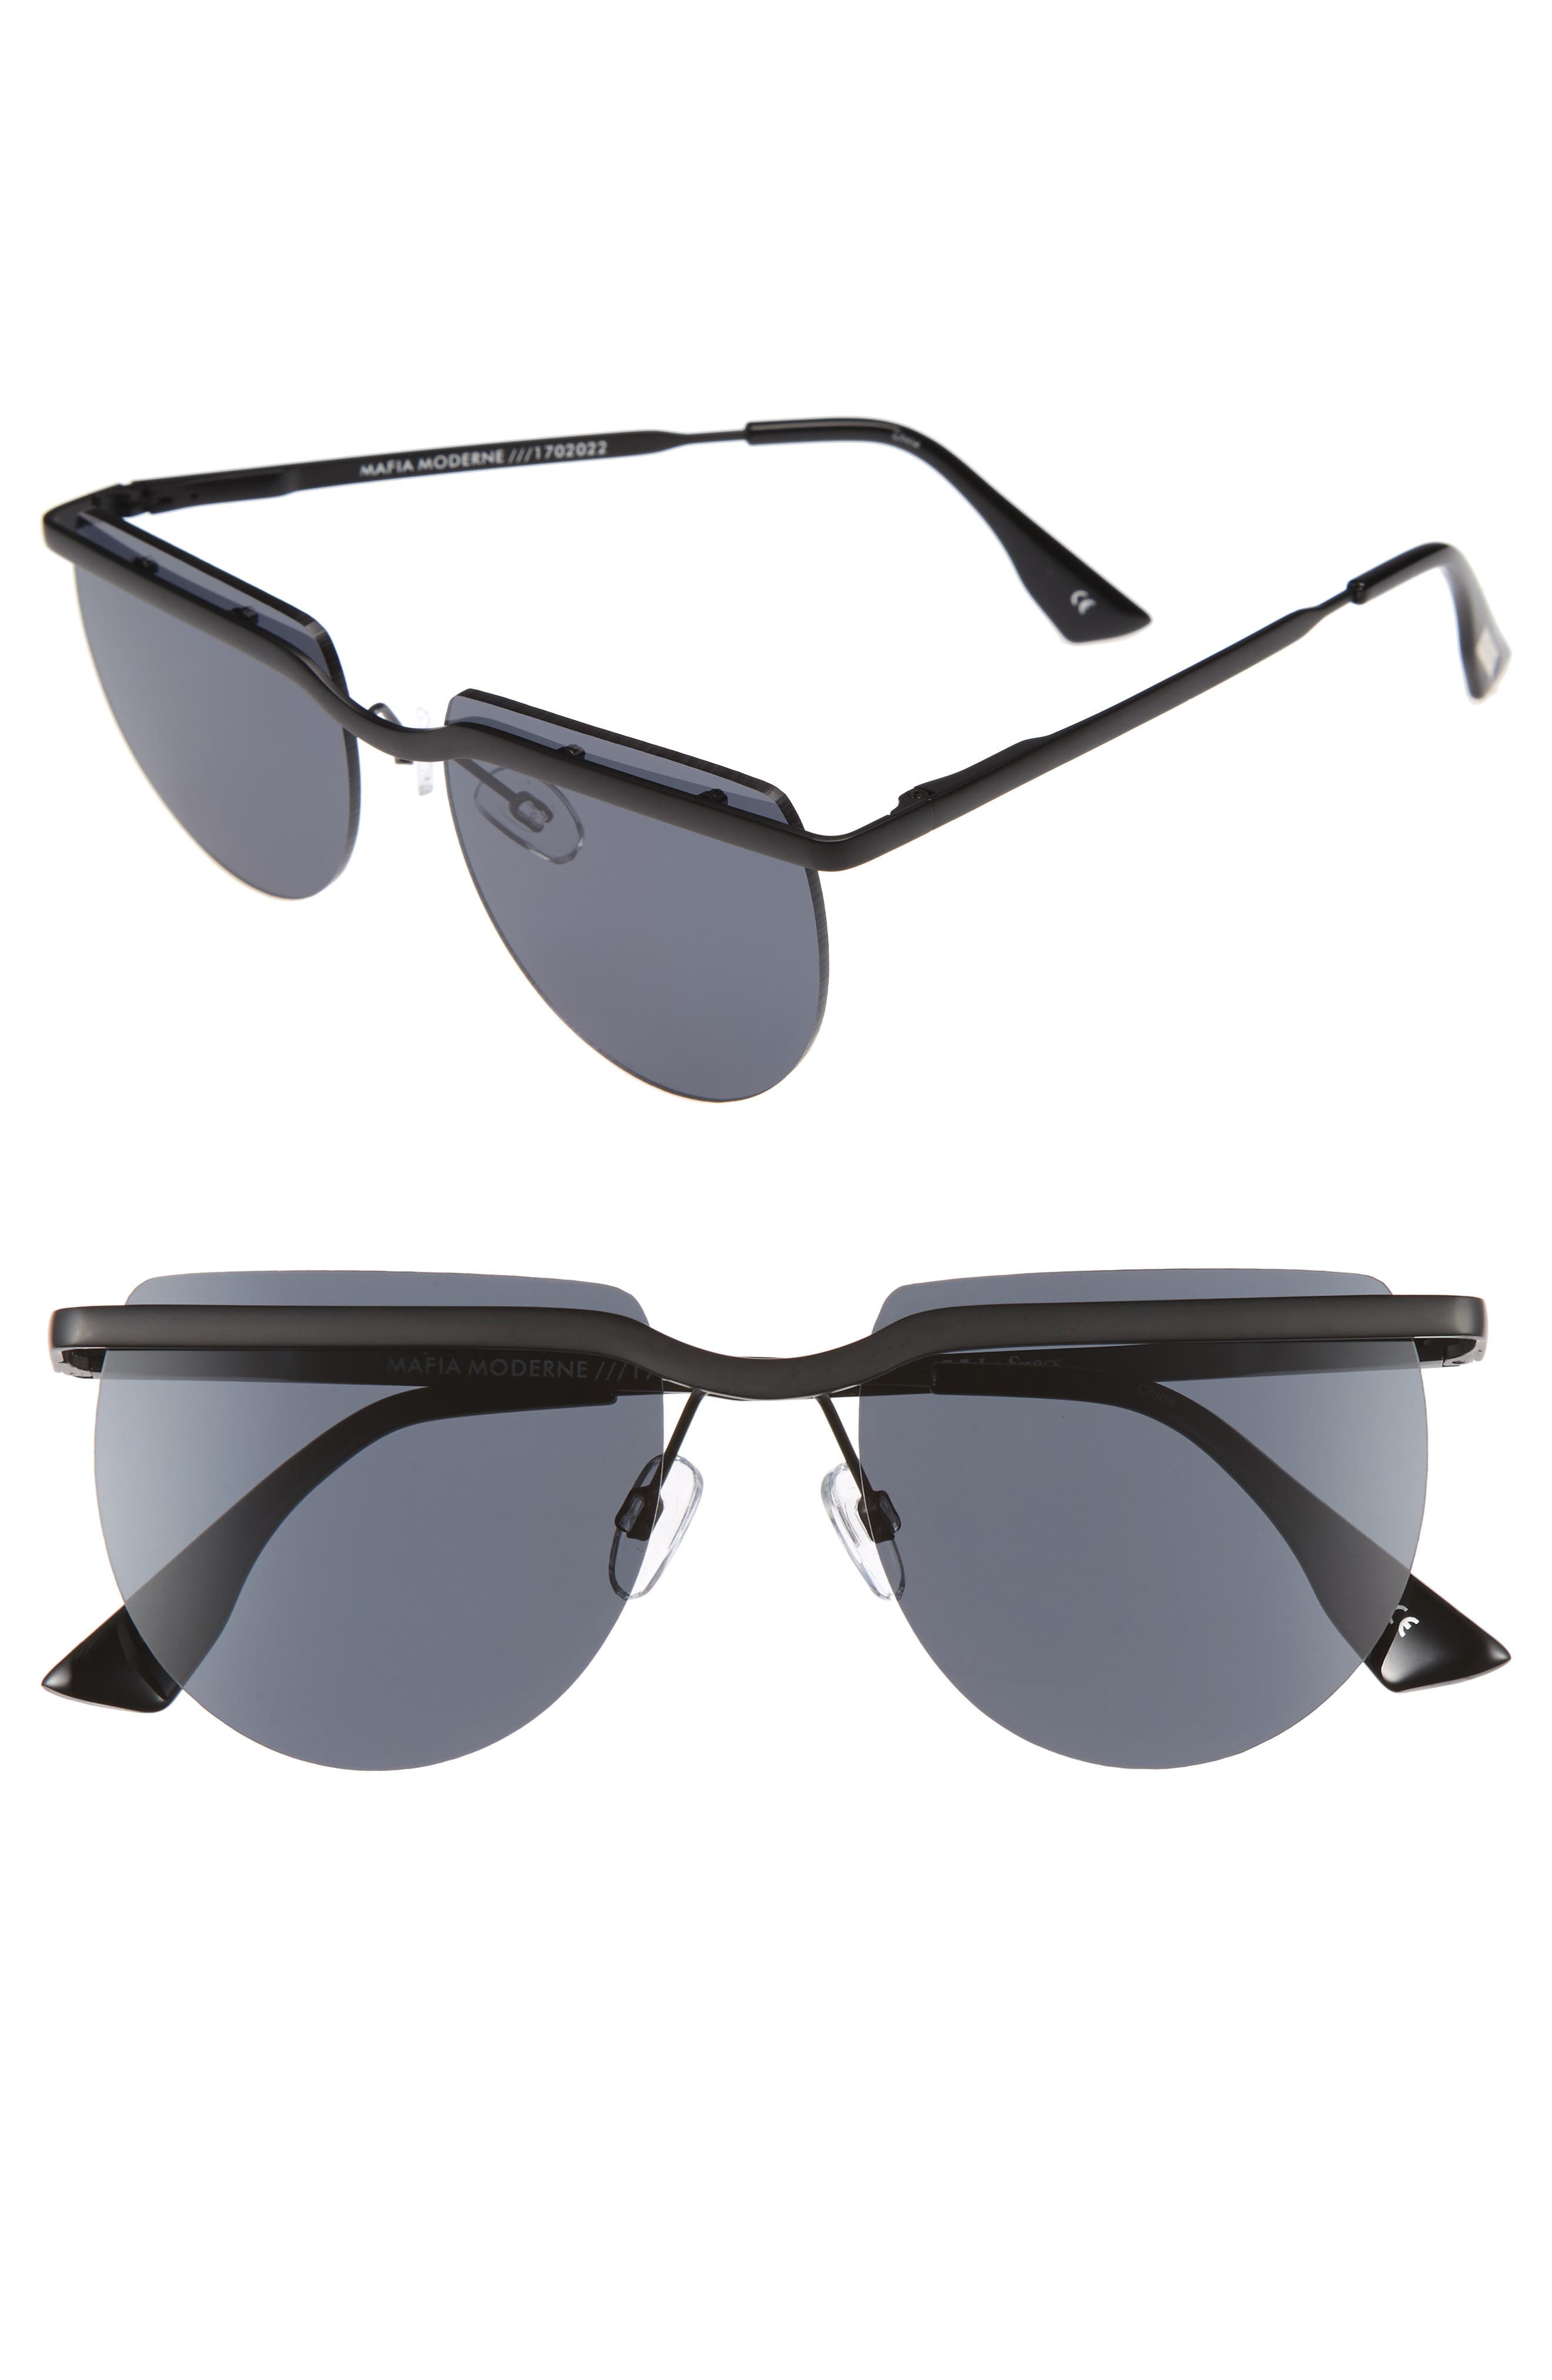 Mafia Moderne 52mm Rimless Sunglasses,                         Main,                         color, Matte Black